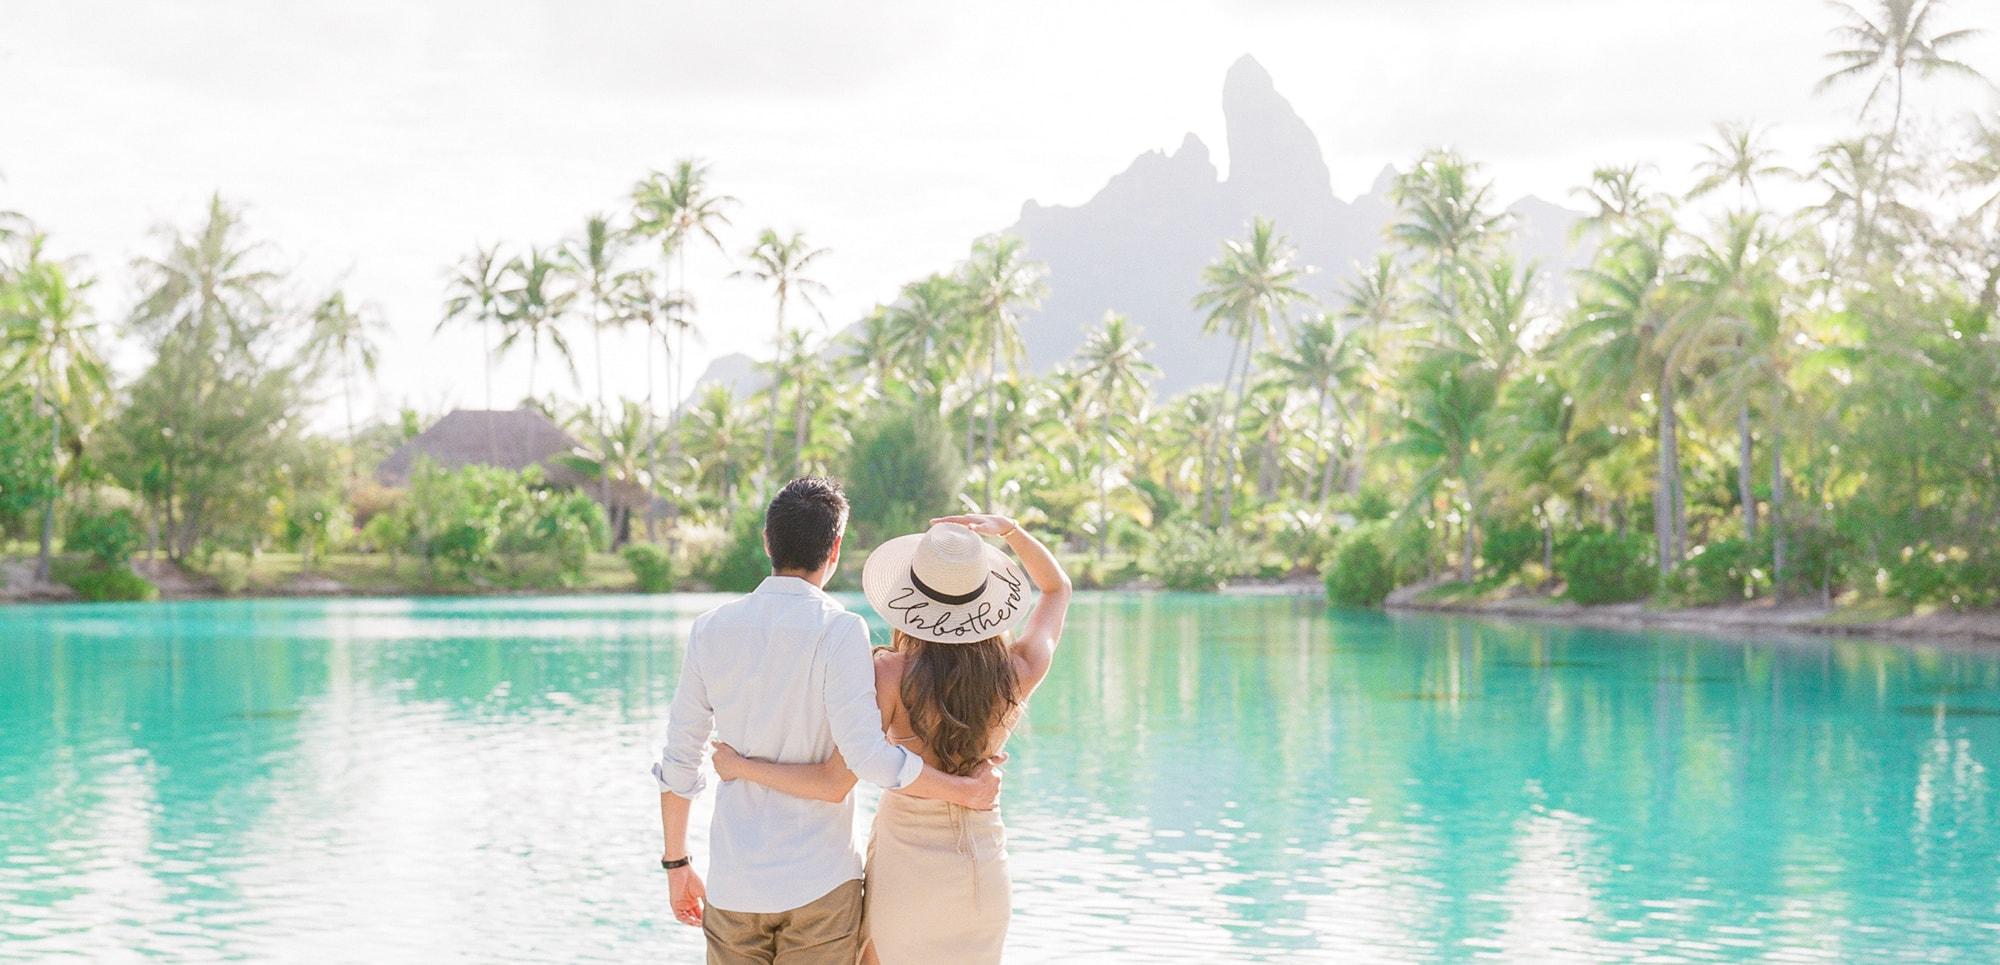 https://tahititourisme.nz/wp-content/uploads/2021/04/PCP-Bora-Bora-Photographer-St-Regis-Honeymoon.jpg